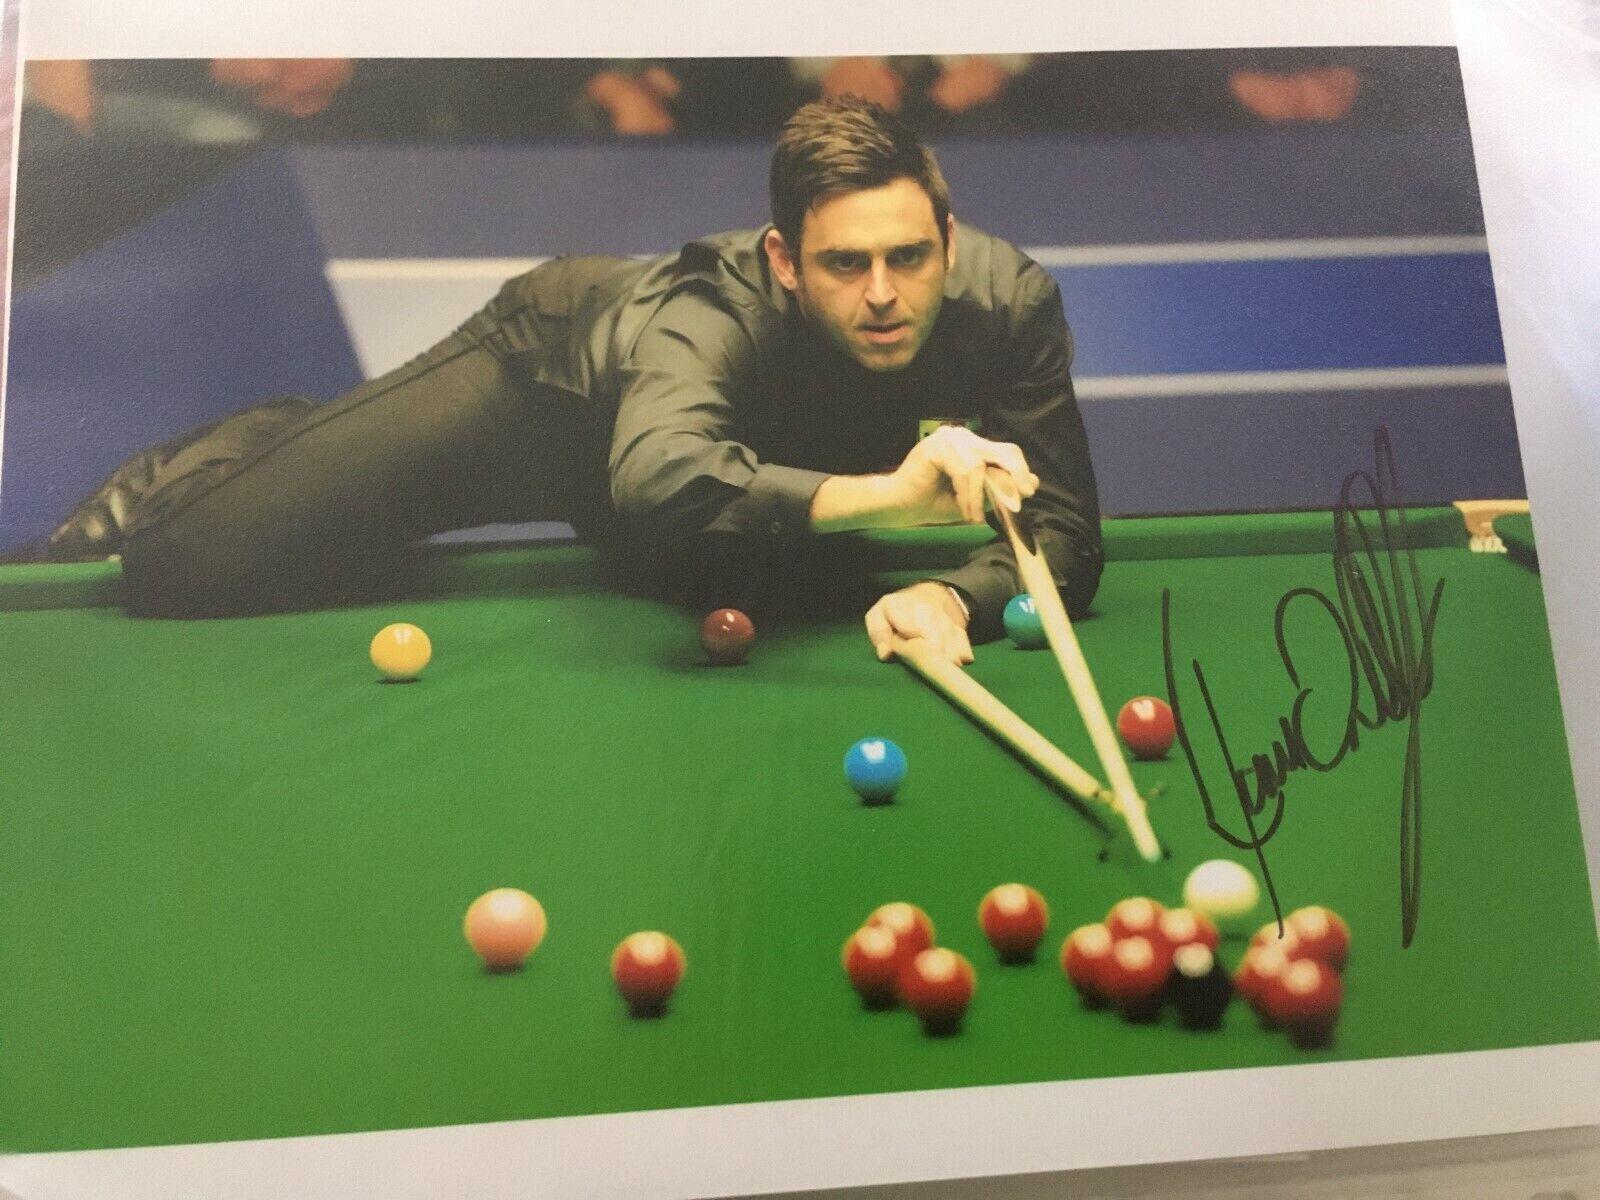 Ronnie O'Sullivan - Signed 10x8 Photo 2020 World Champion